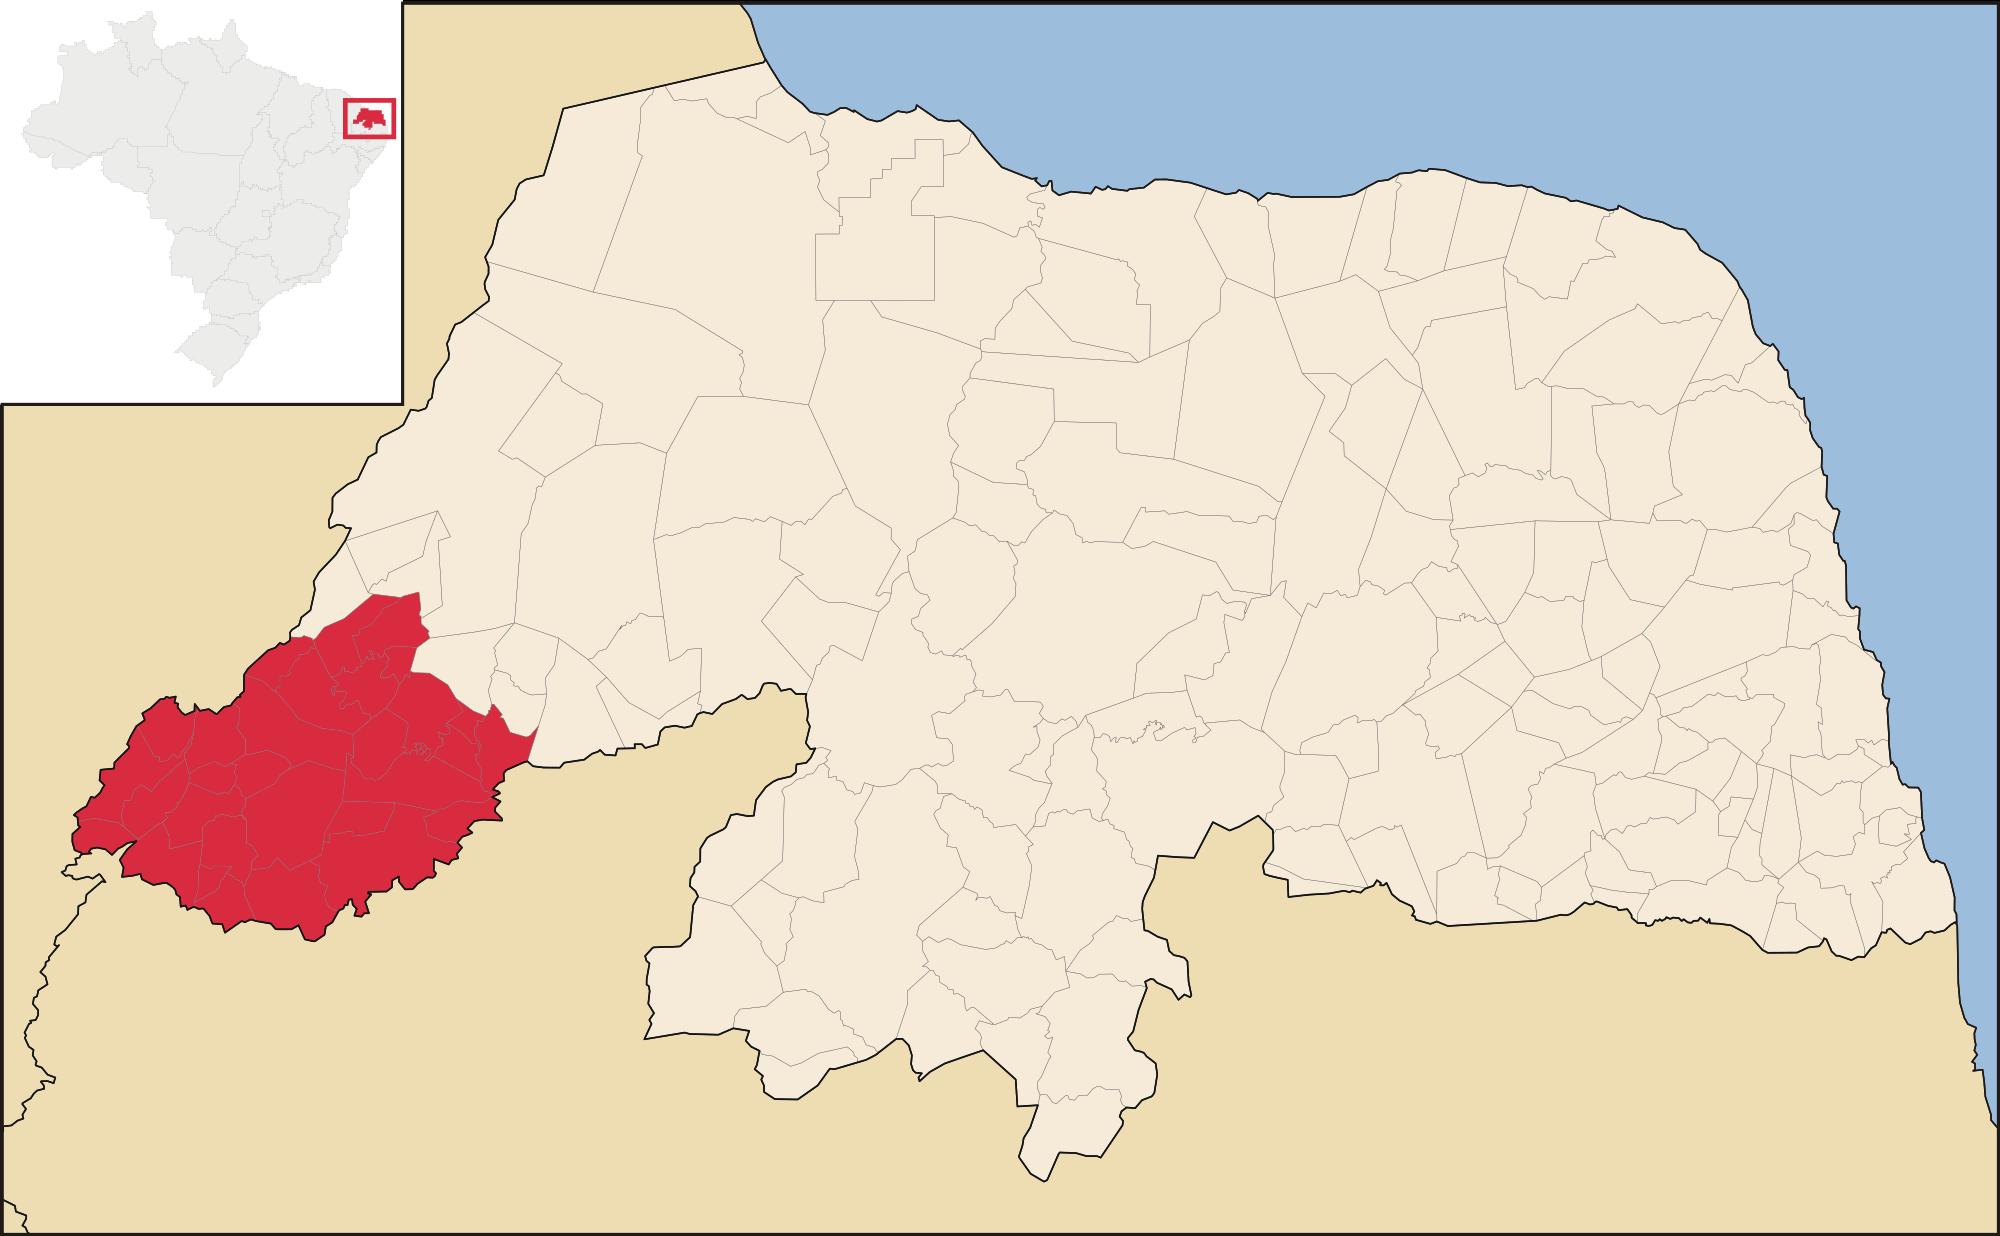 Ficheiro:Alto Oeste Potiguar.png